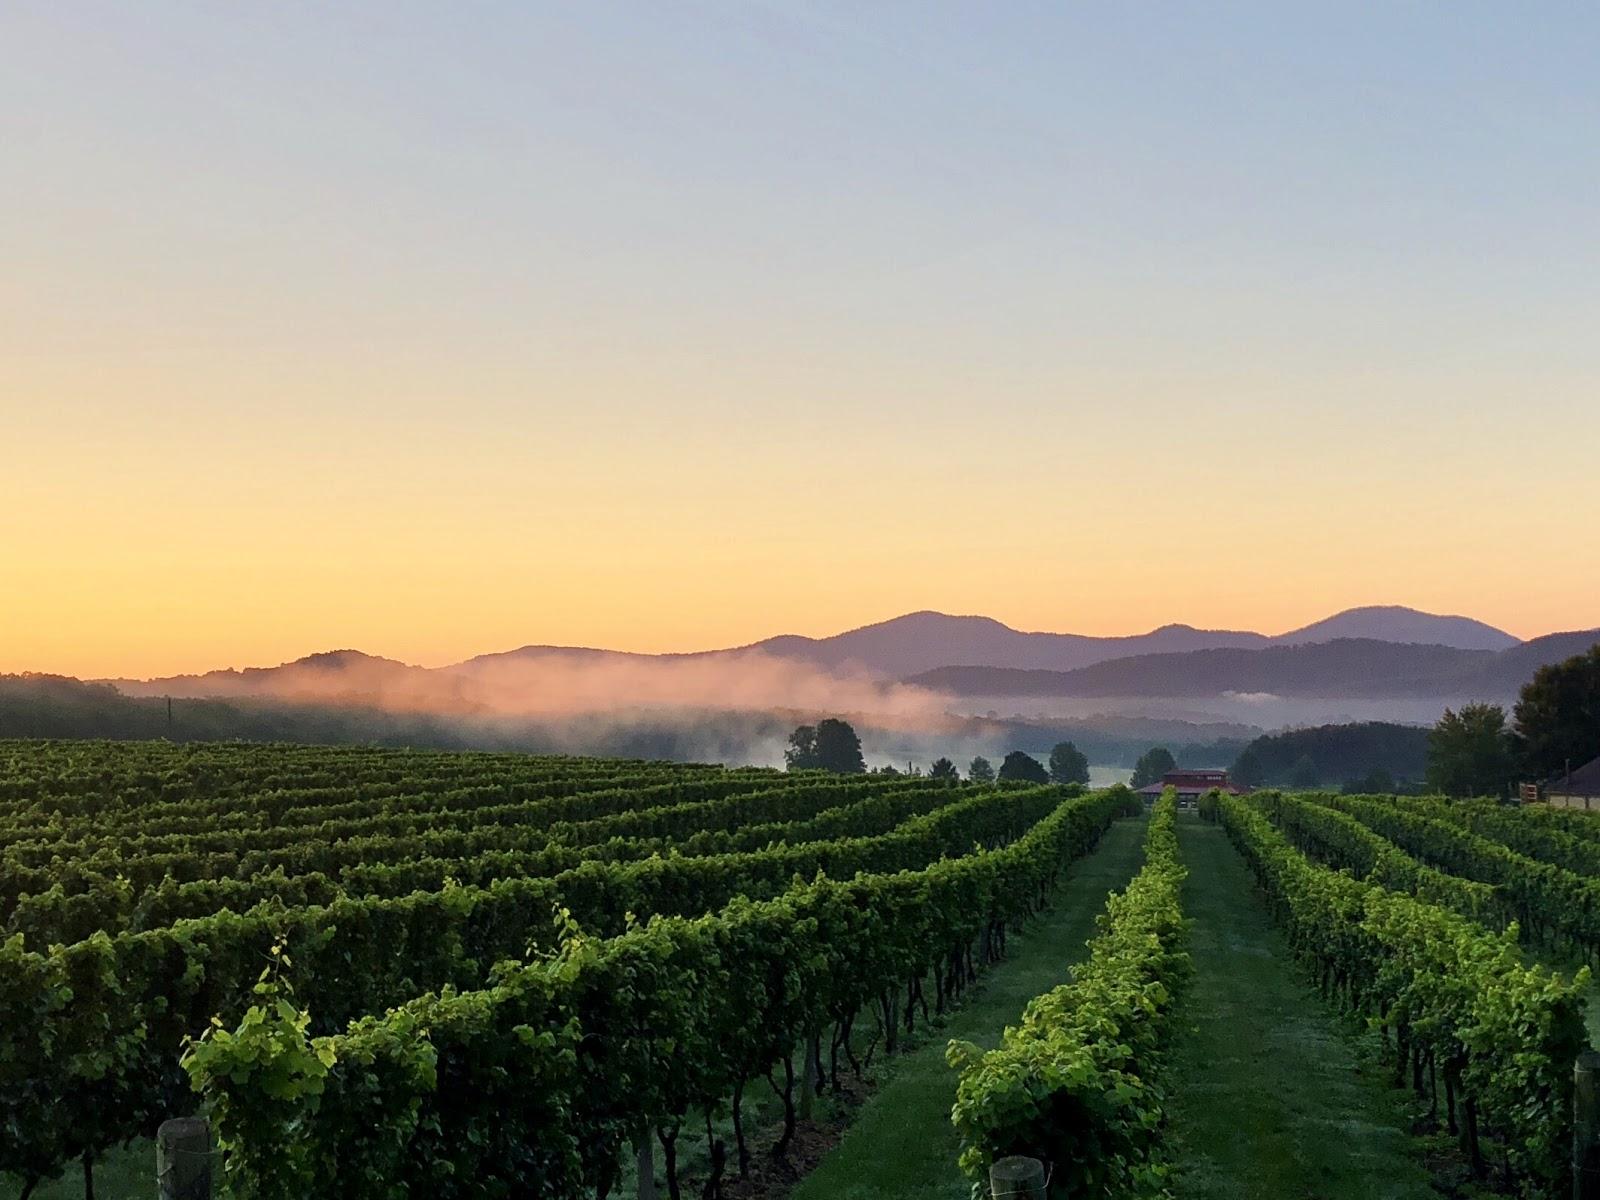 Afton Mountain Vineyards: A Blue Ridge Beauty